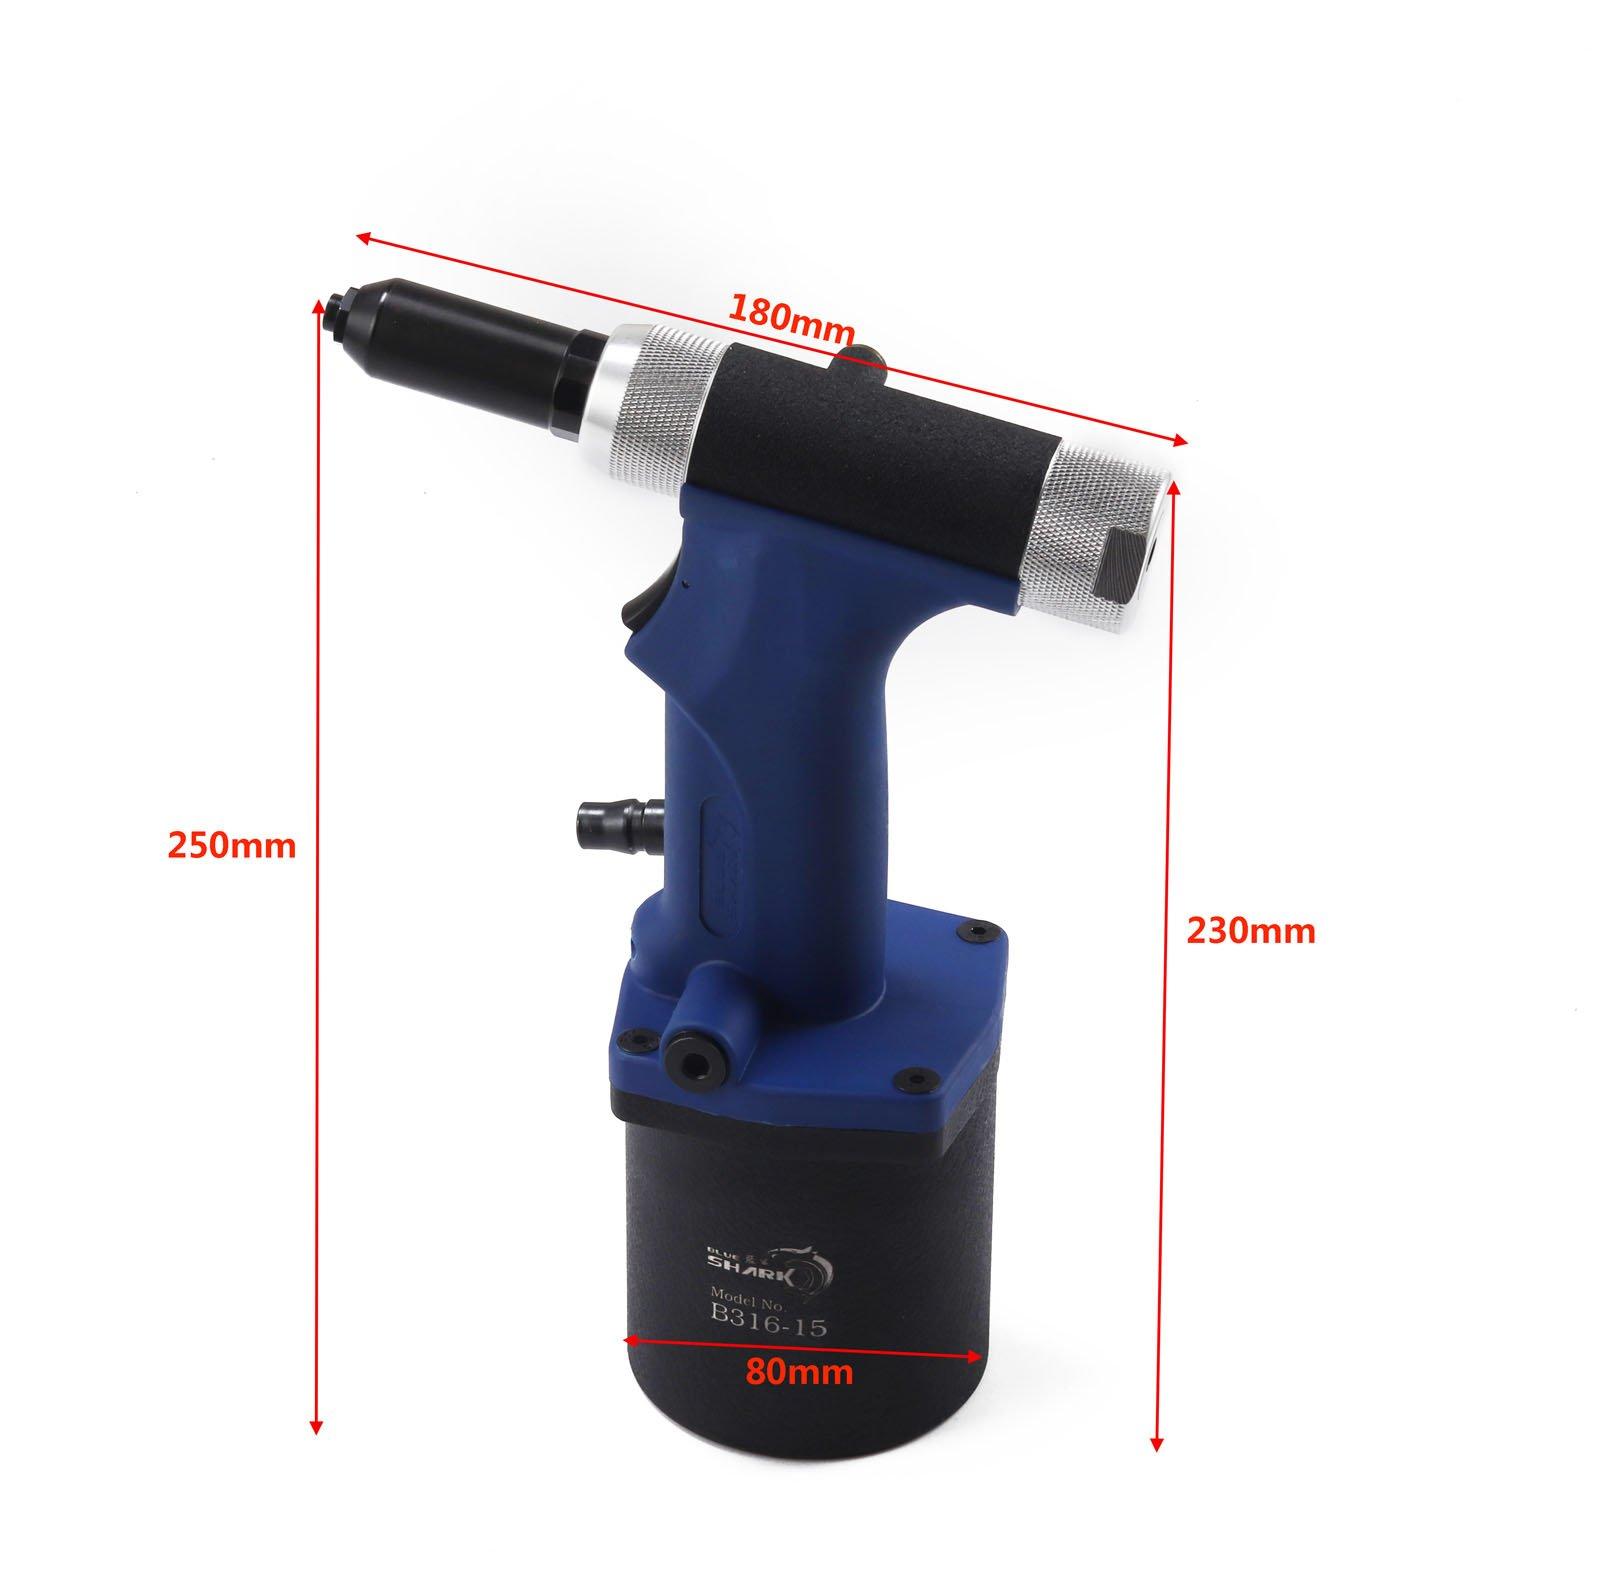 Professional Air/Hydraulic Rivet Gun Four nose Riveting Tool Air Power Tool B316-15 by SHUQIU (Image #2)